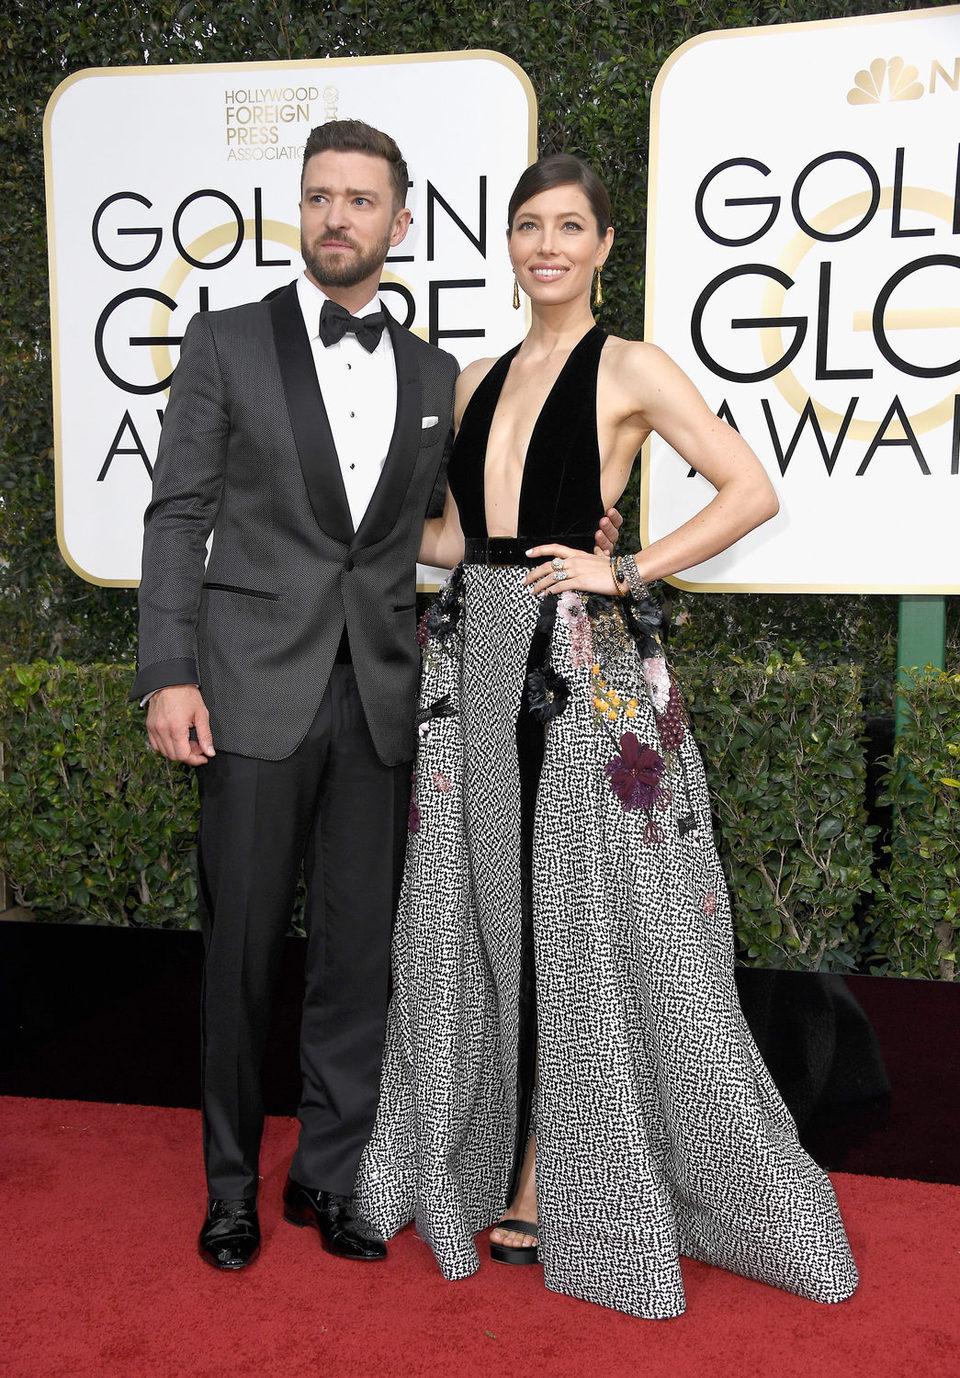 Justin Timberlake, Jessica Biel at the 2017 Golden Globes red carpet